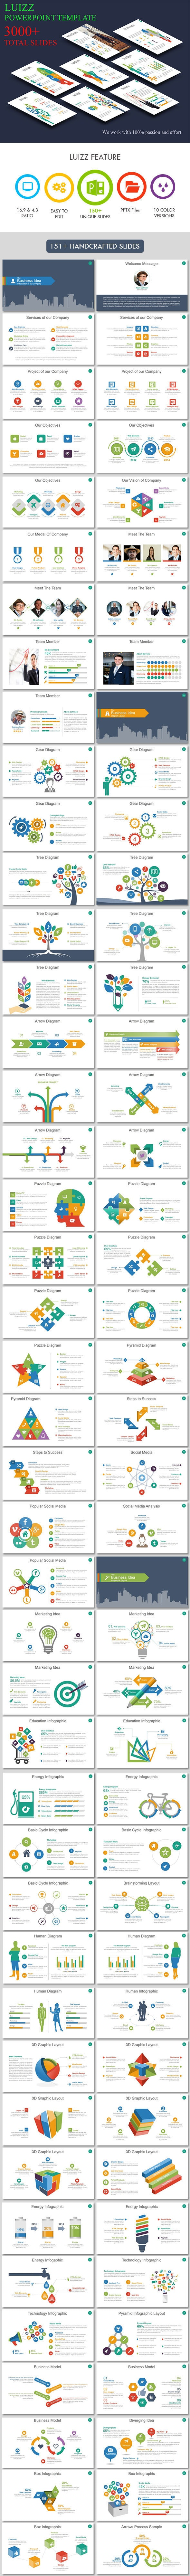 Business Idea 2016 - Google Slides Presentation Templates